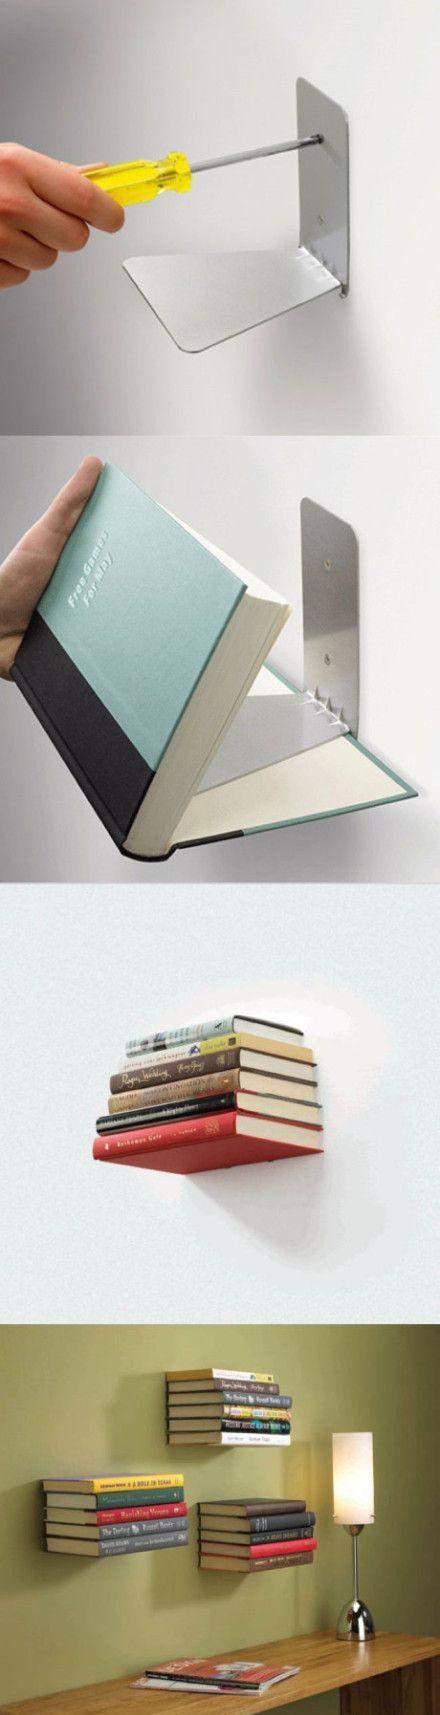 Rak buku yang simple dan unik